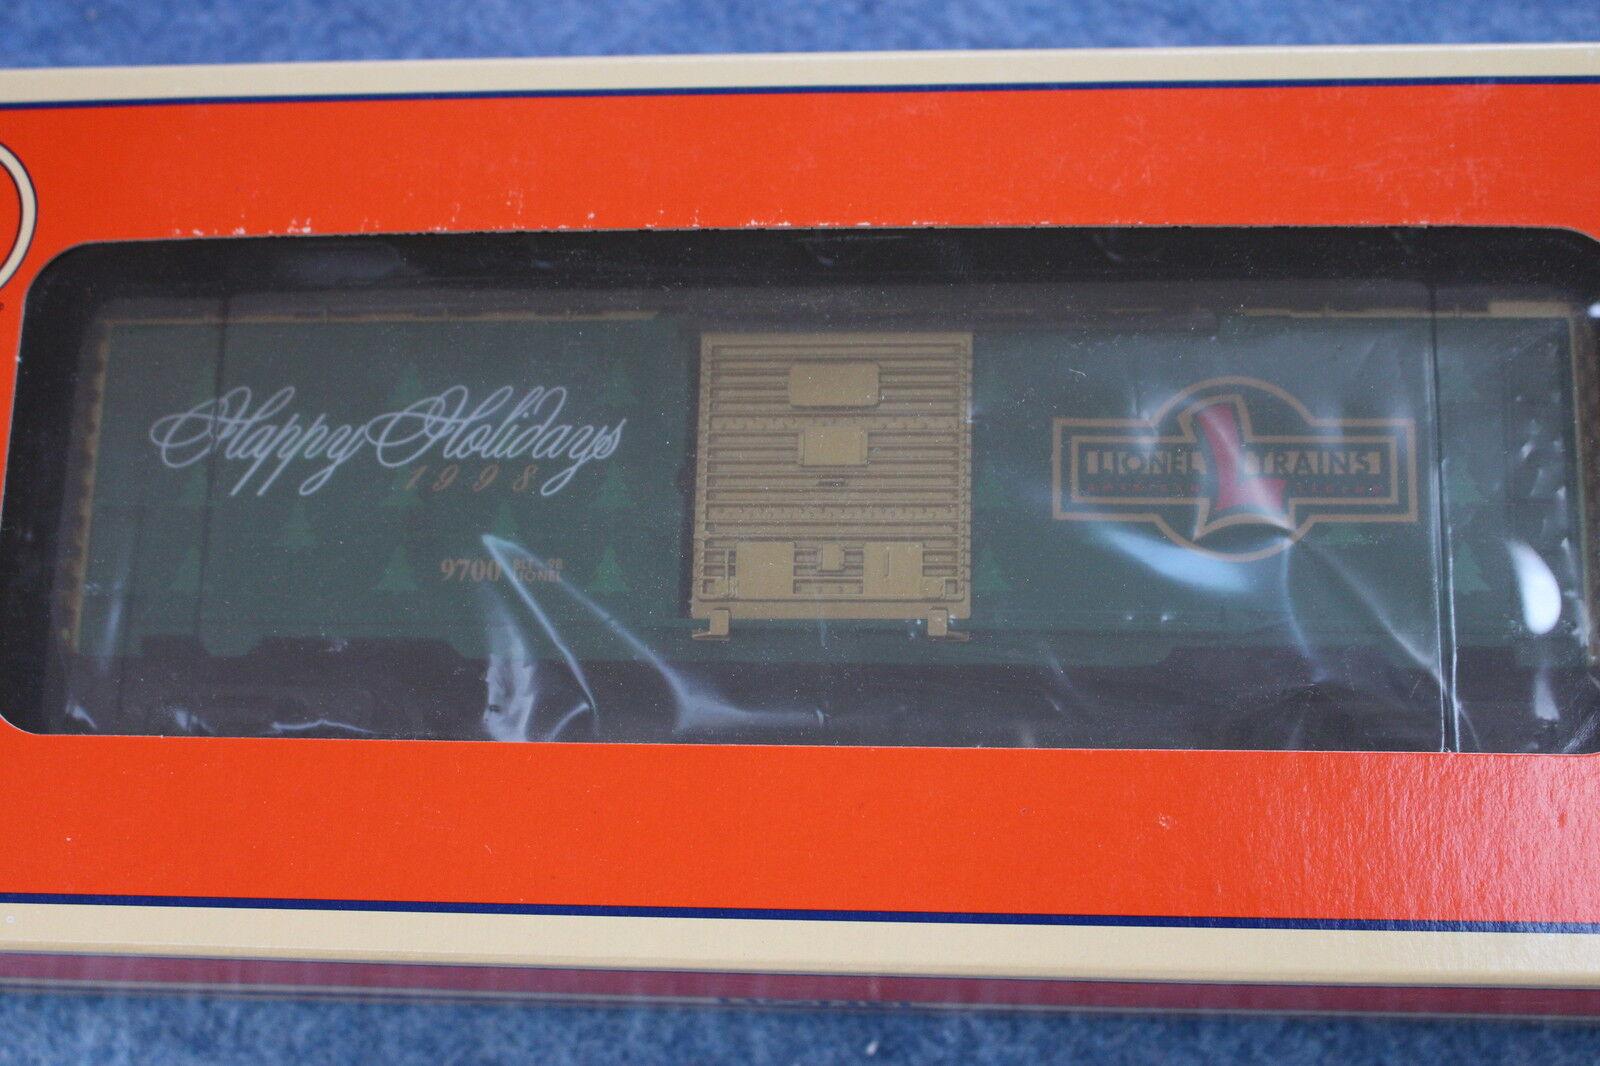 1998 Lionel 6-16291 1998 Christmas Box Car Happy Holidays L2725